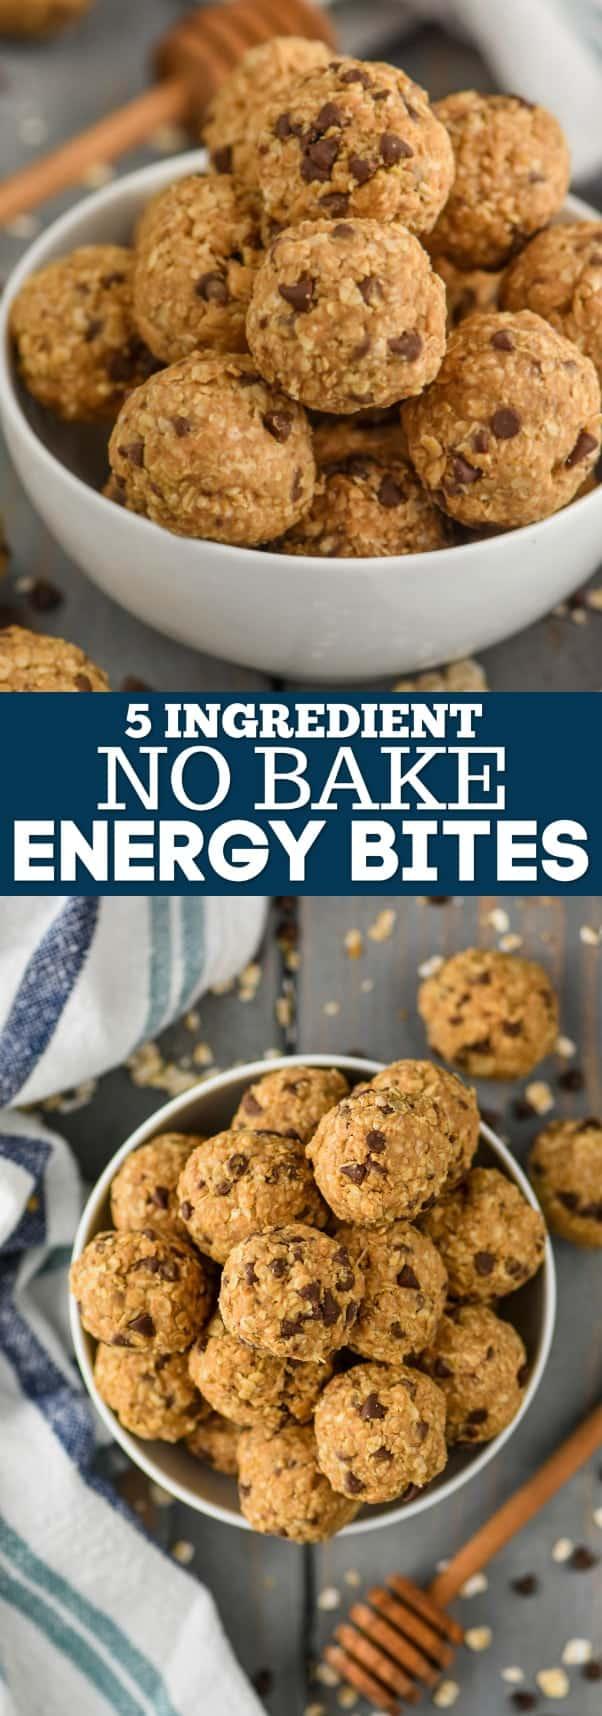 collage of no bake energy bites